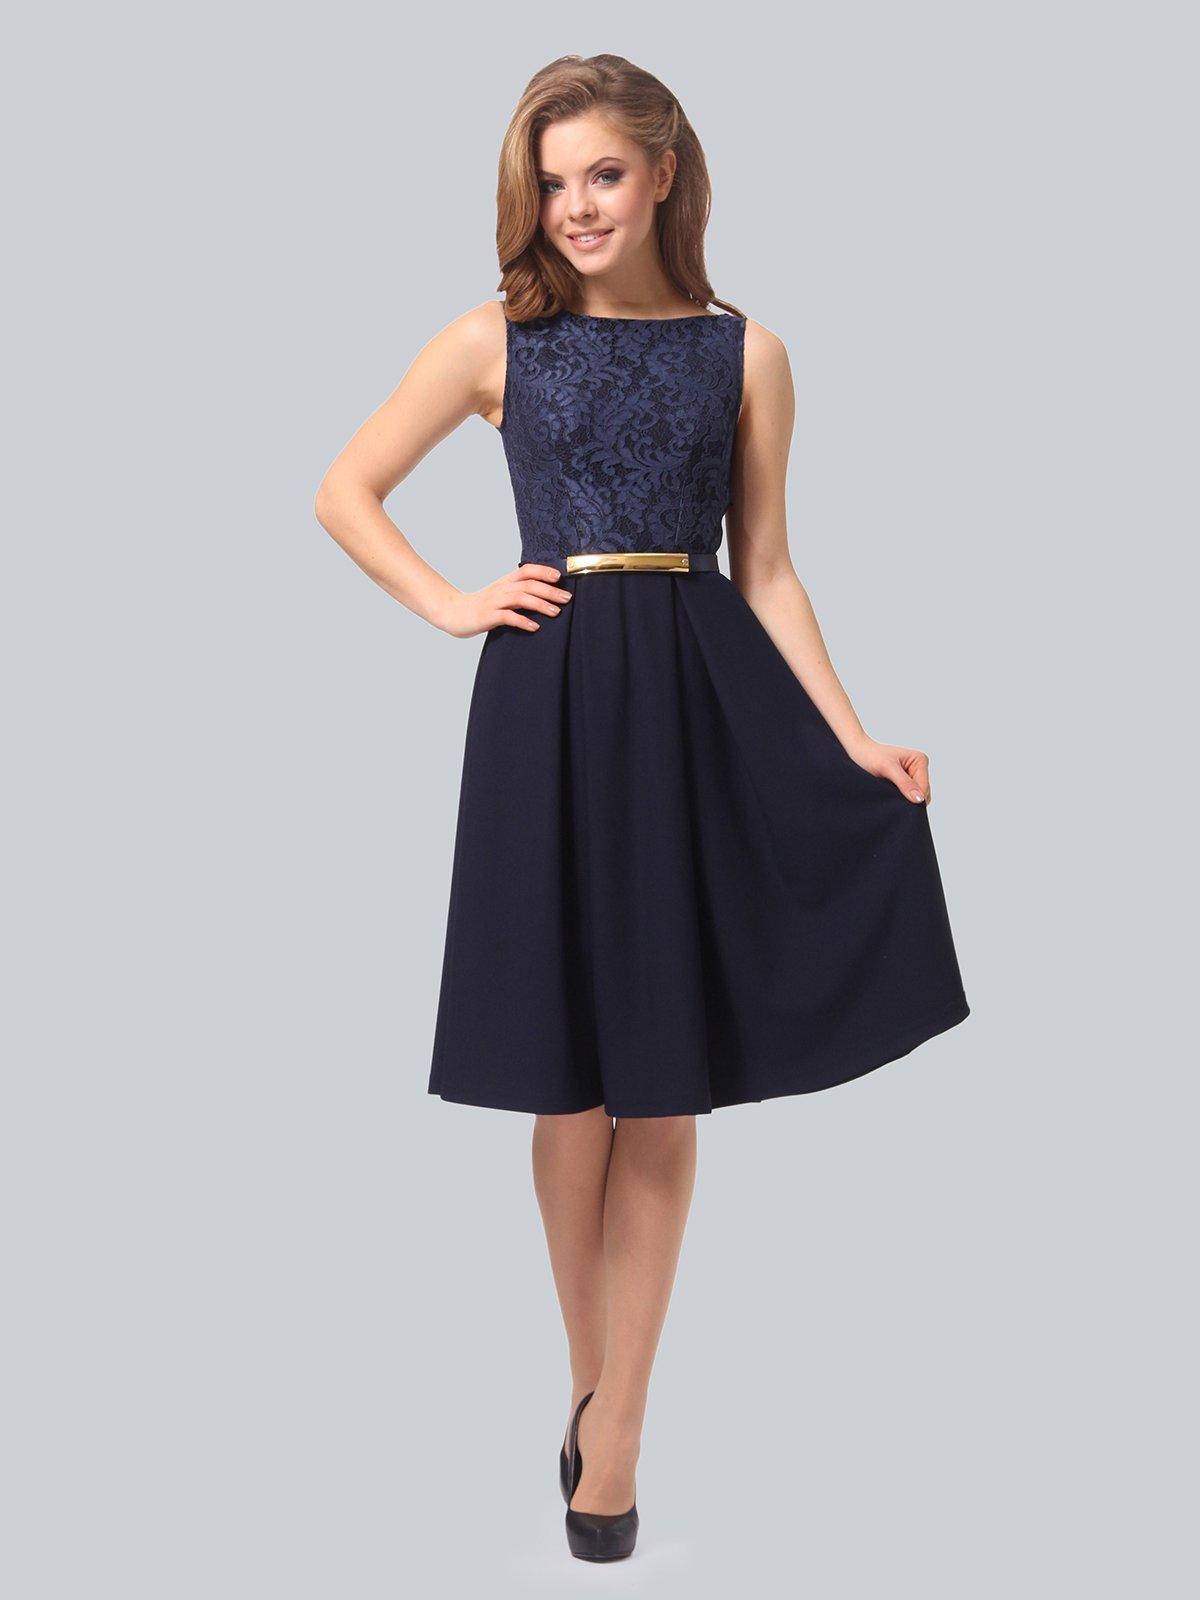 Платье темно-синее | 3863266 | фото 2